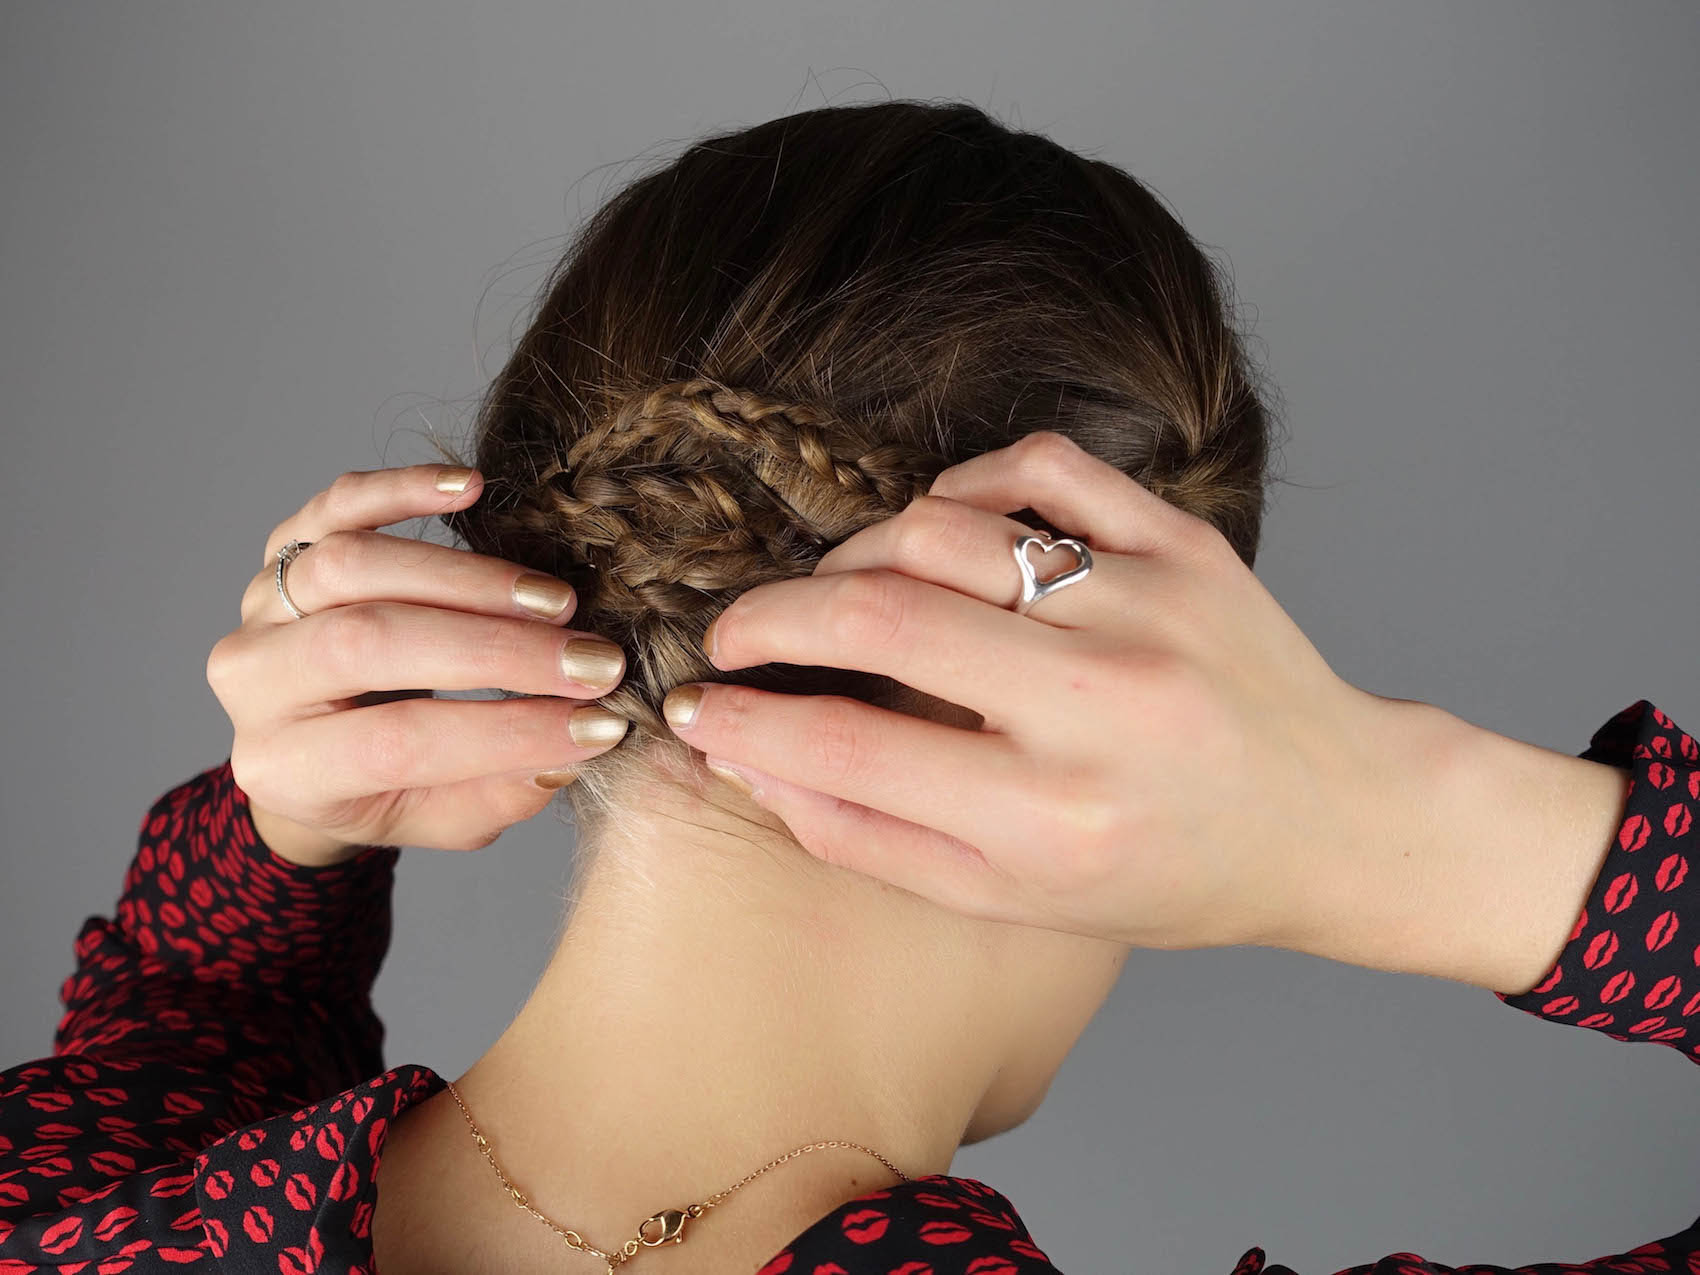 4_2_Suelovesnyc_Silvester_frisuren_styles_newyears_hairstyles_hairstyling_taft_schwarzkopf_susan_fengler_aufmacher_flechtfrisur_winter